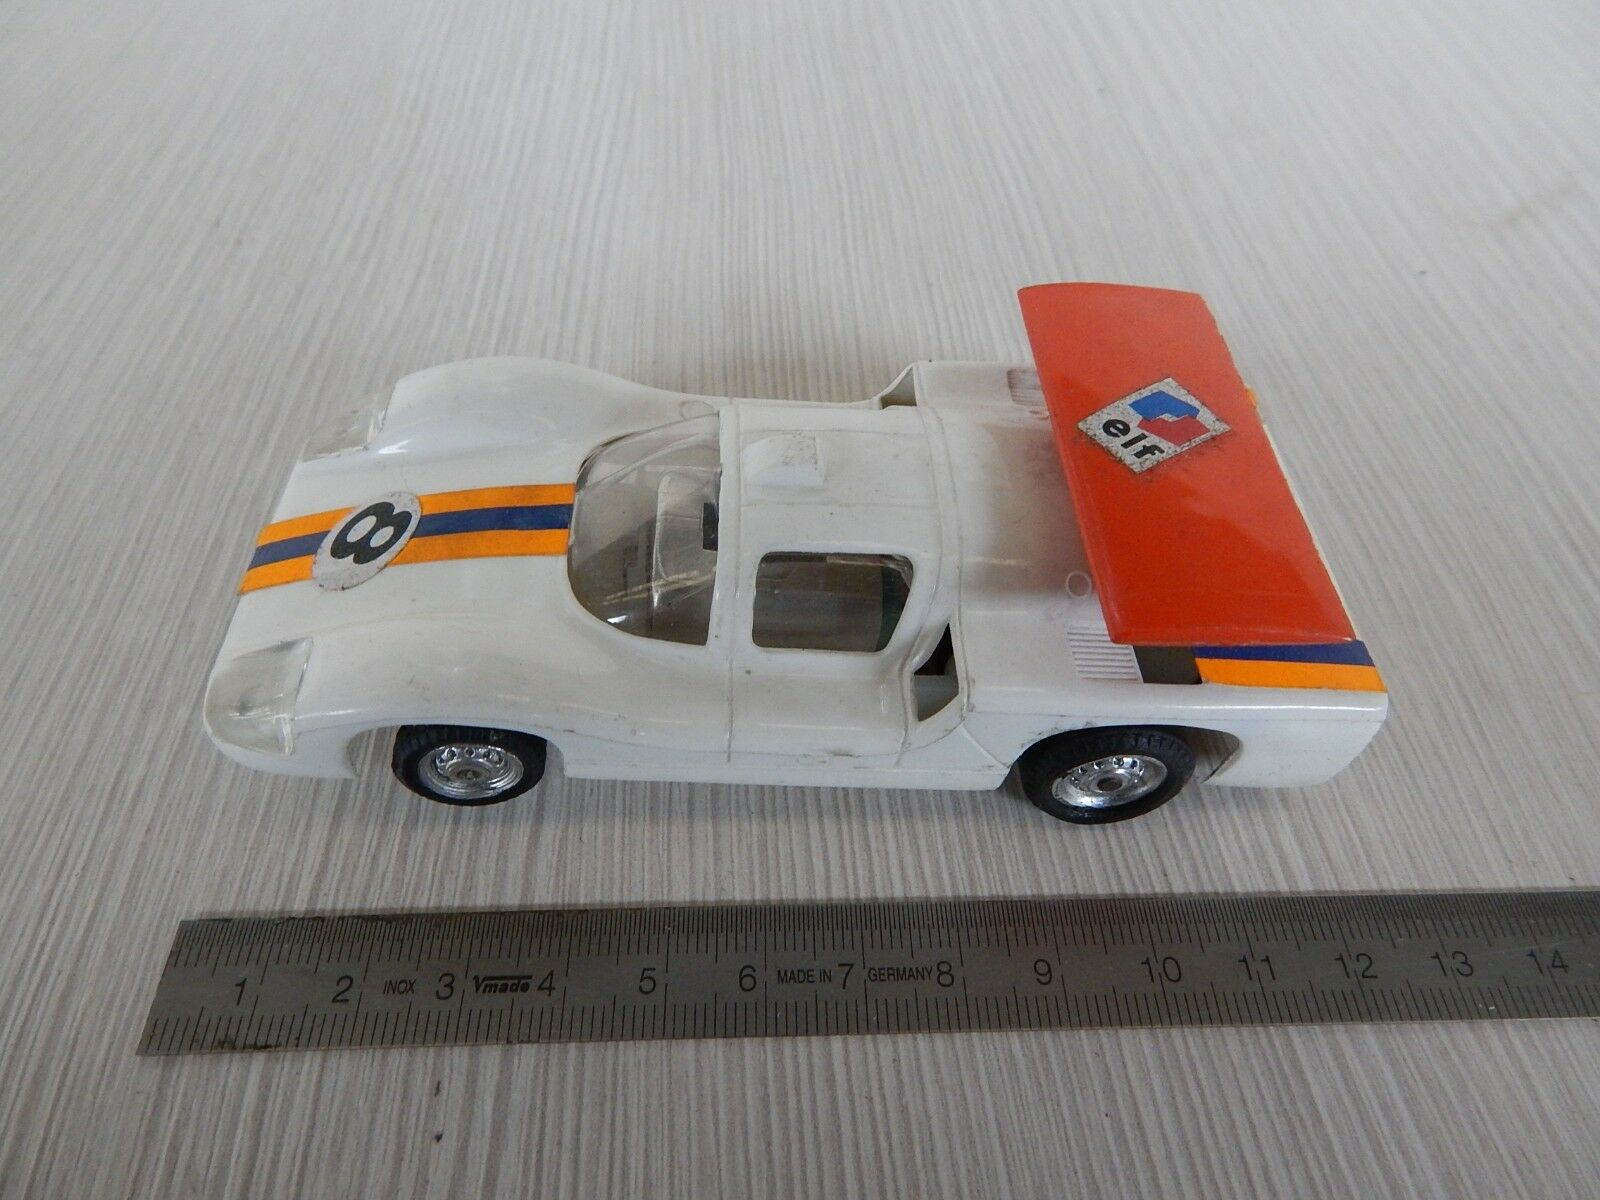 RARA POLICAR SLOT CAR CHAPARRALL 2F scala 1 32 SLOTCAR